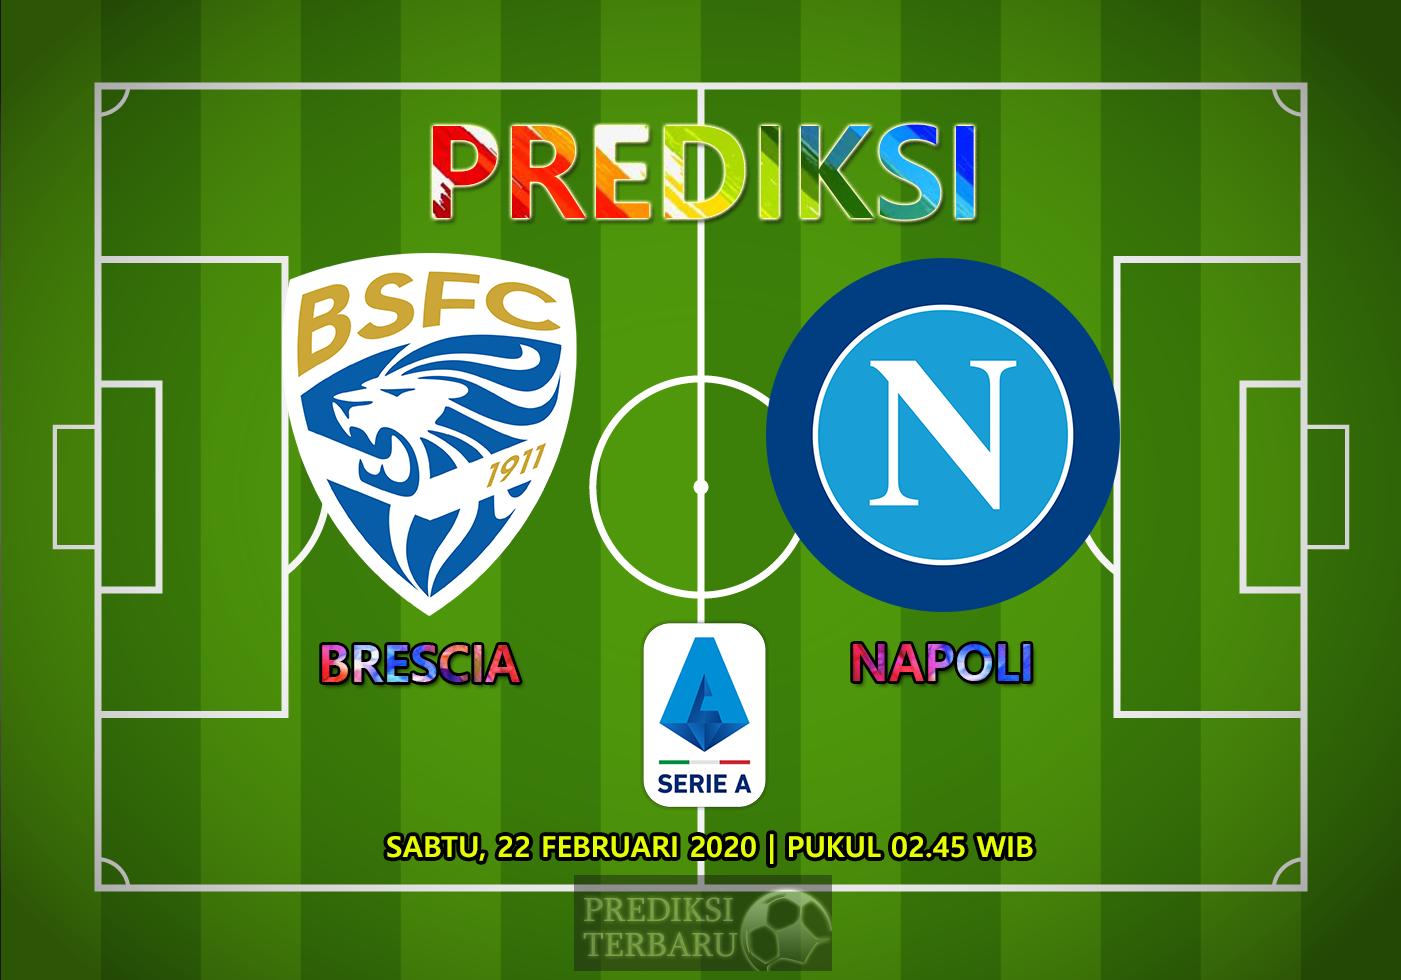 Prediksi Brescia Vs Napoli, Sabtu 22 Februari